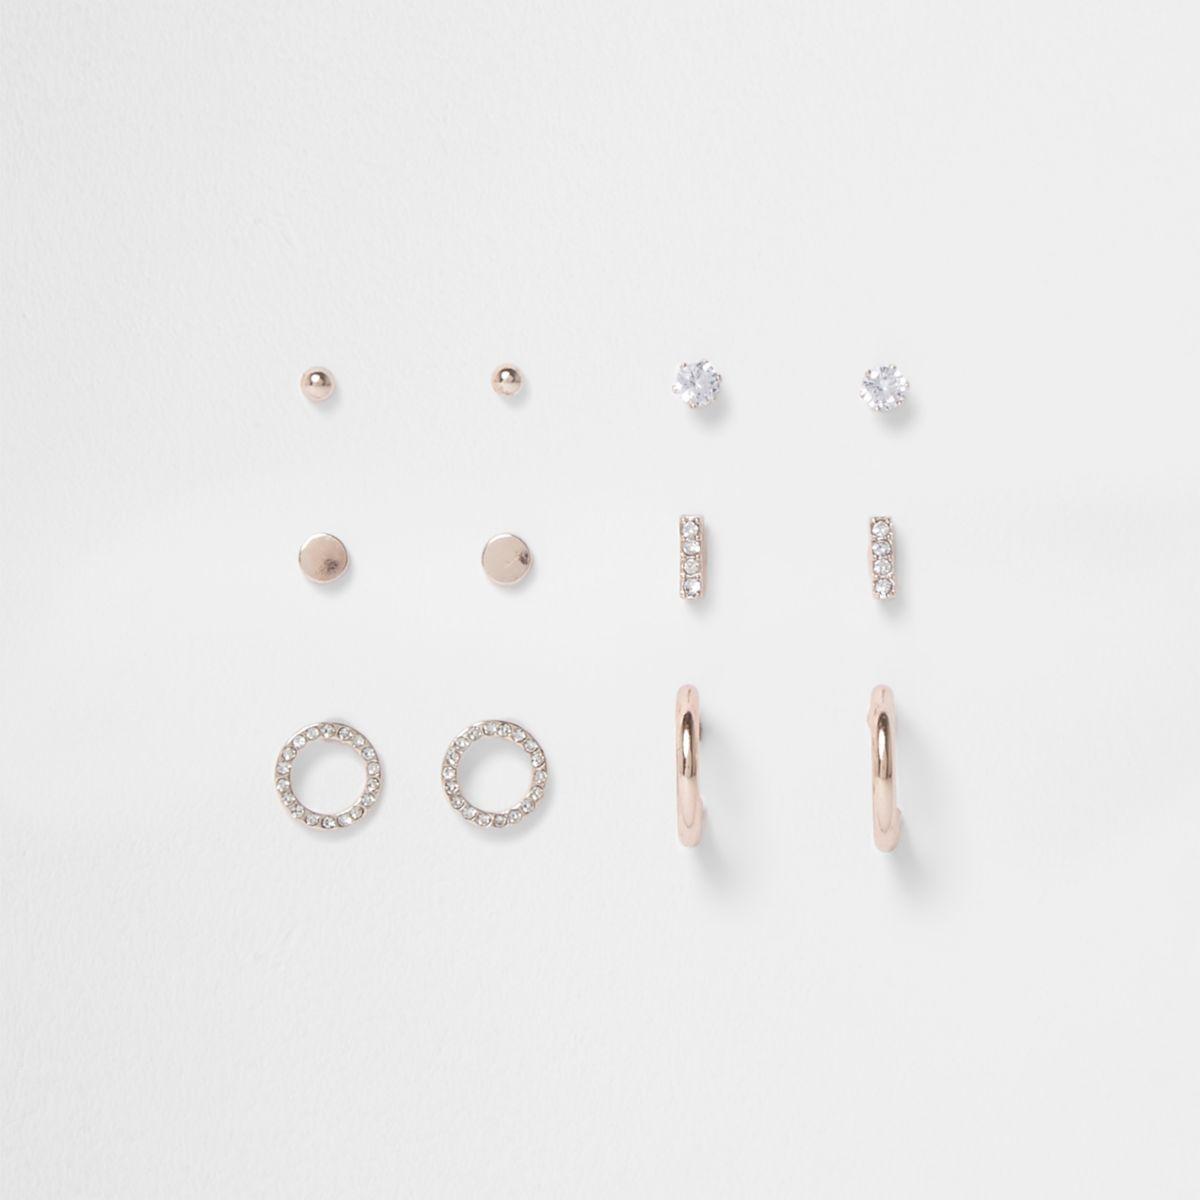 Rose gold rhinestone pave earrings pack